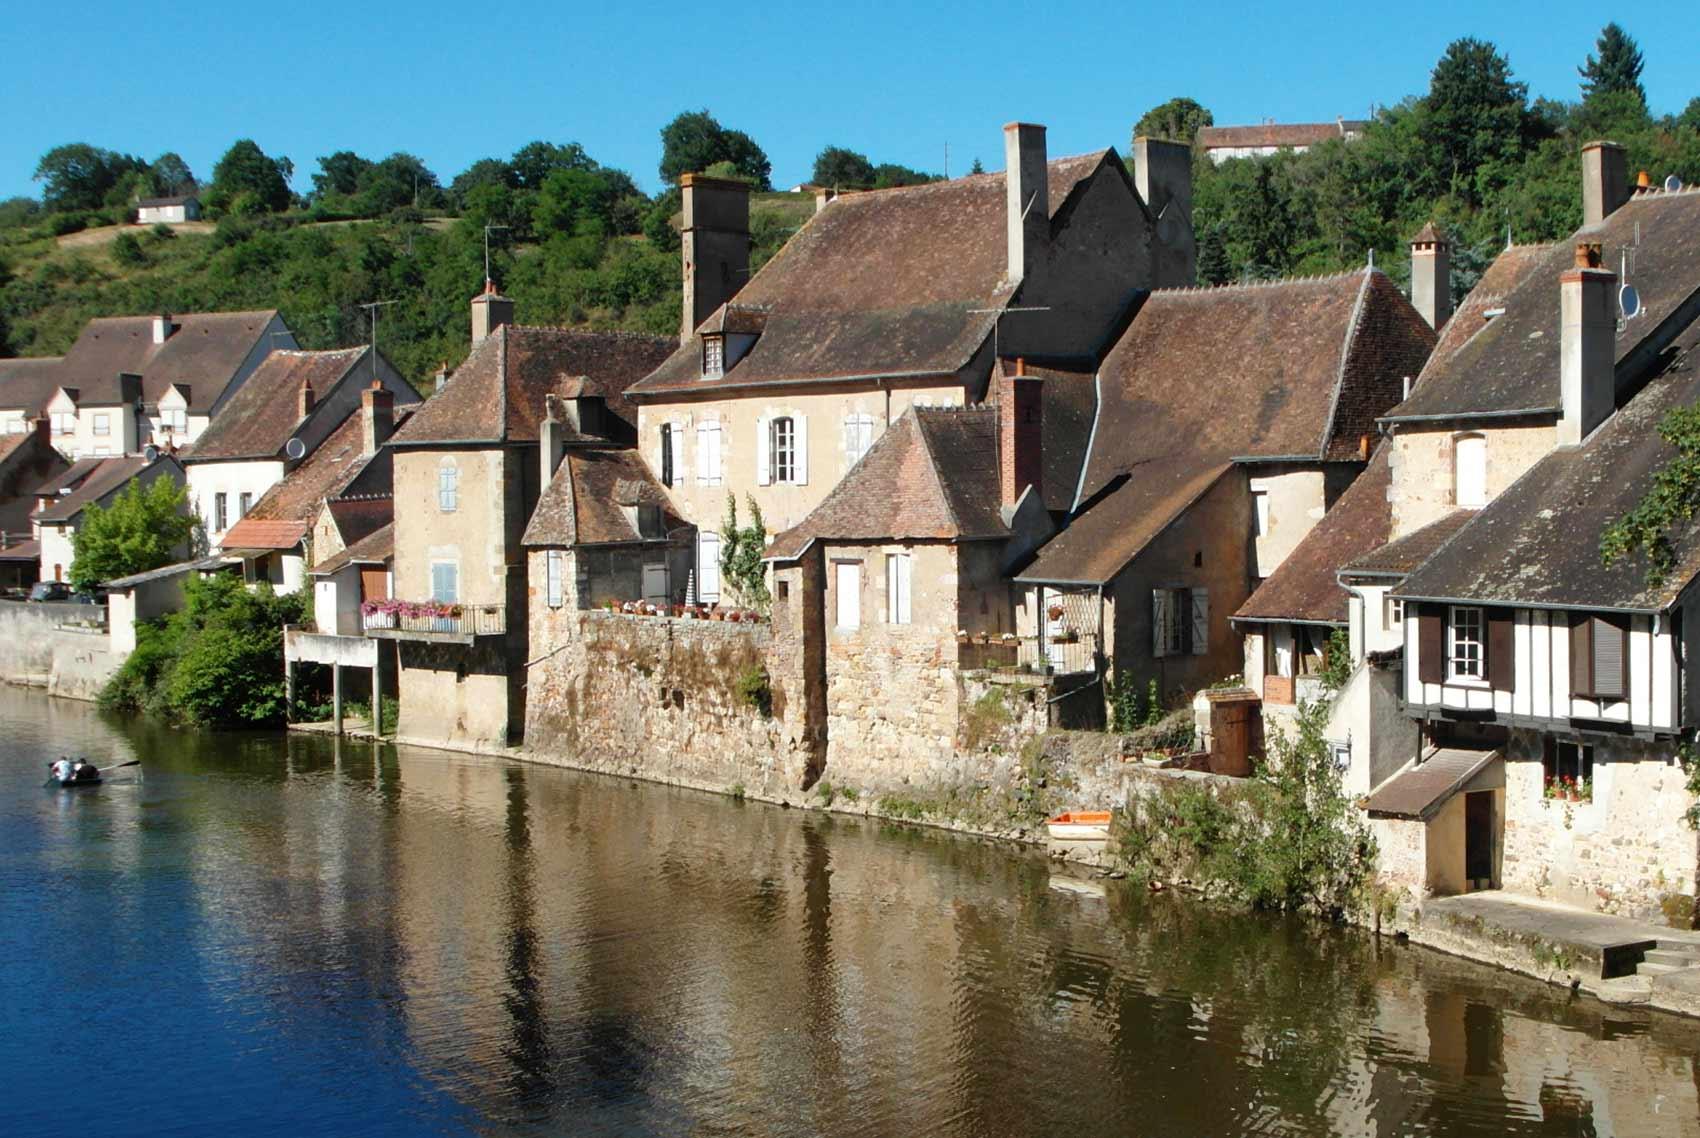 Omgeving, dorpje Herisson, Allier, Auvergne